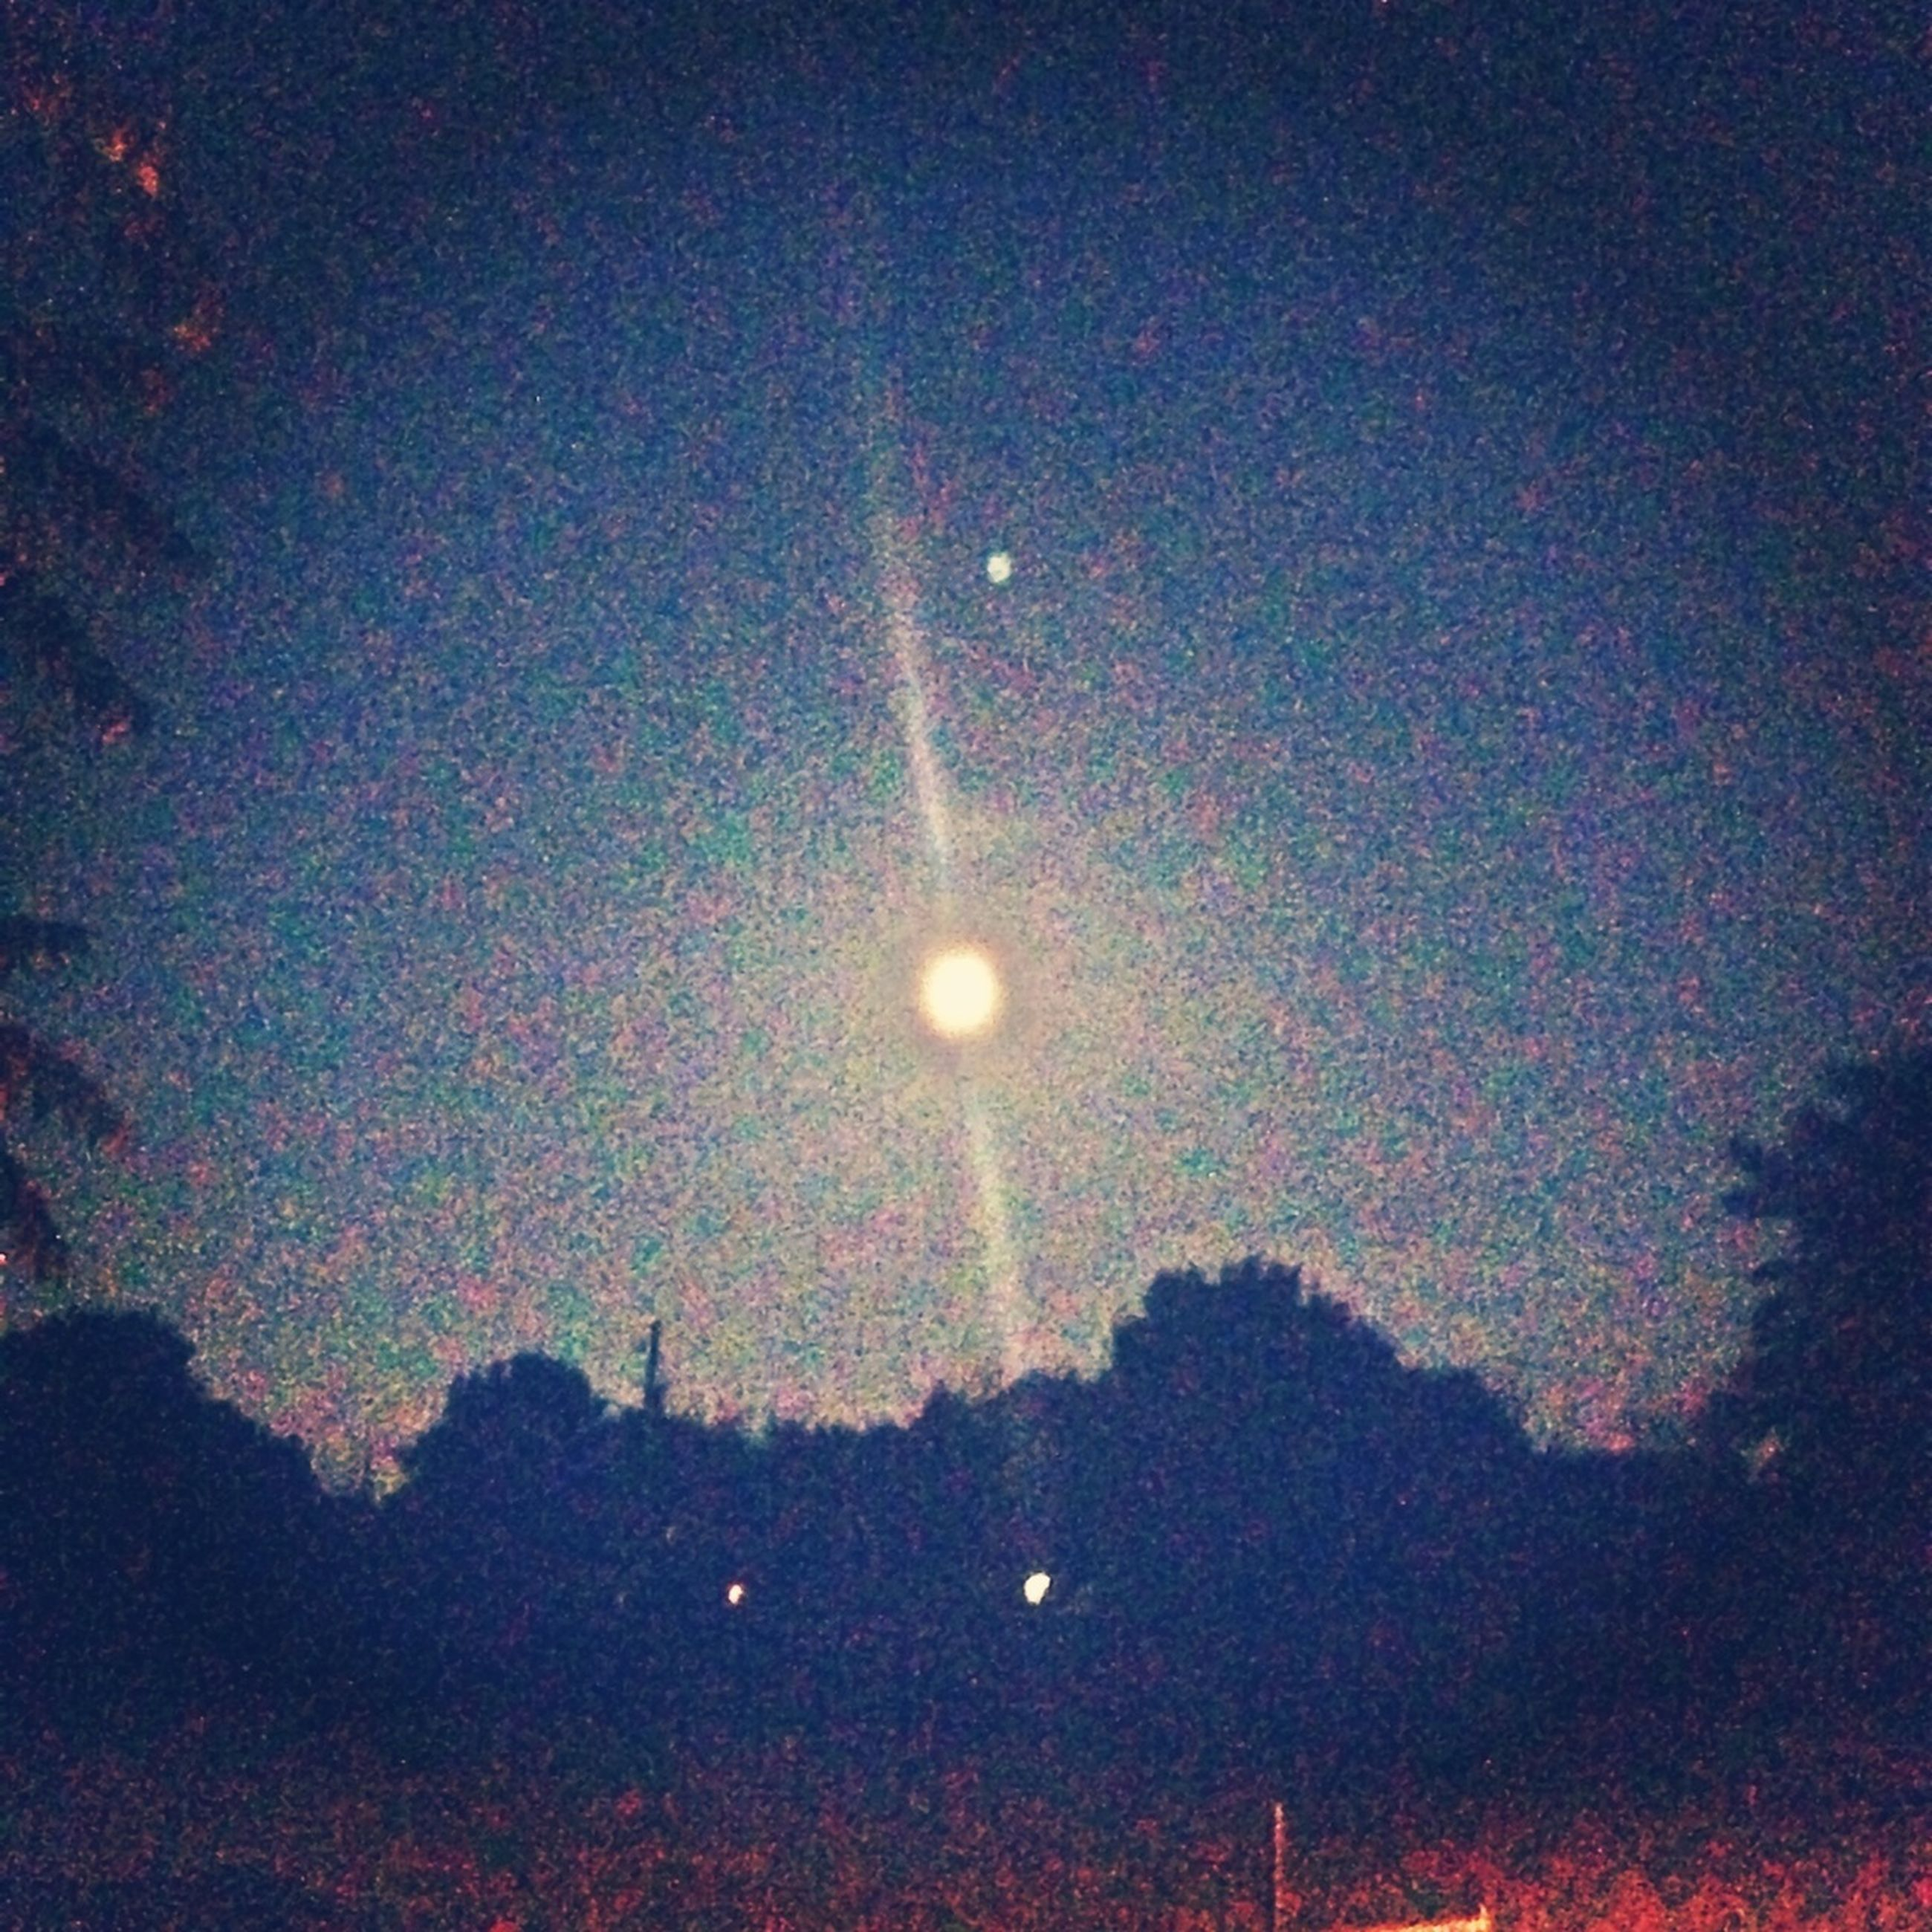 night, moon, illuminated, sky, low angle view, astronomy, scenics, tranquility, beauty in nature, full moon, dark, tranquil scene, nature, silhouette, street light, star - space, idyllic, lighting equipment, glowing, tree